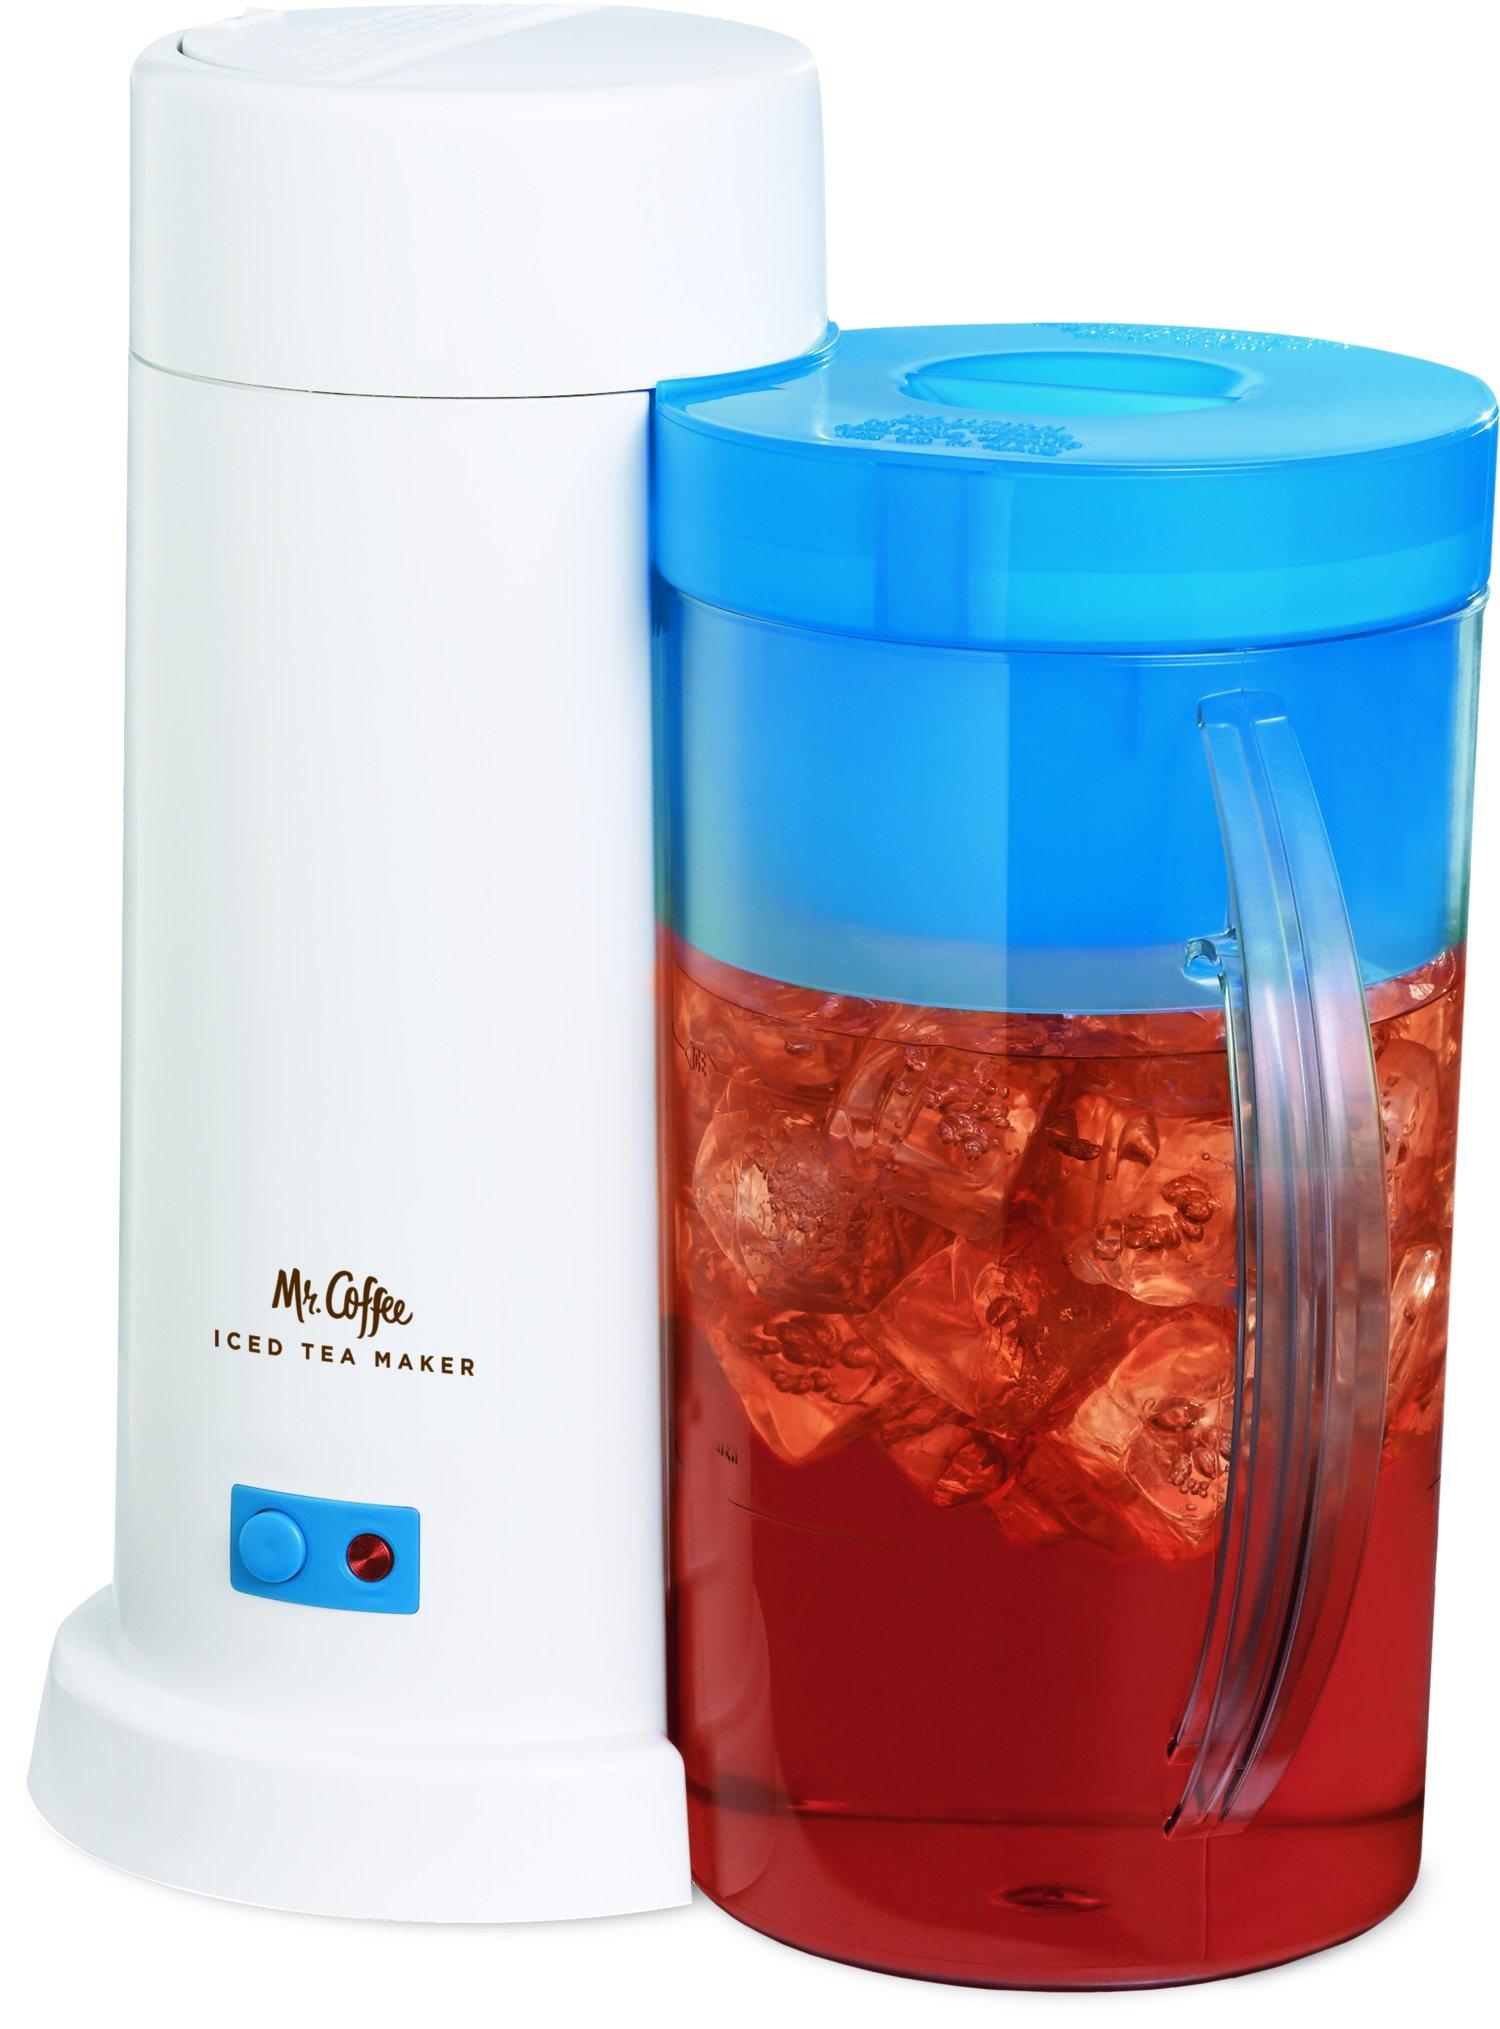 mr coffee 2 quart iced tea maker blue. Black Bedroom Furniture Sets. Home Design Ideas